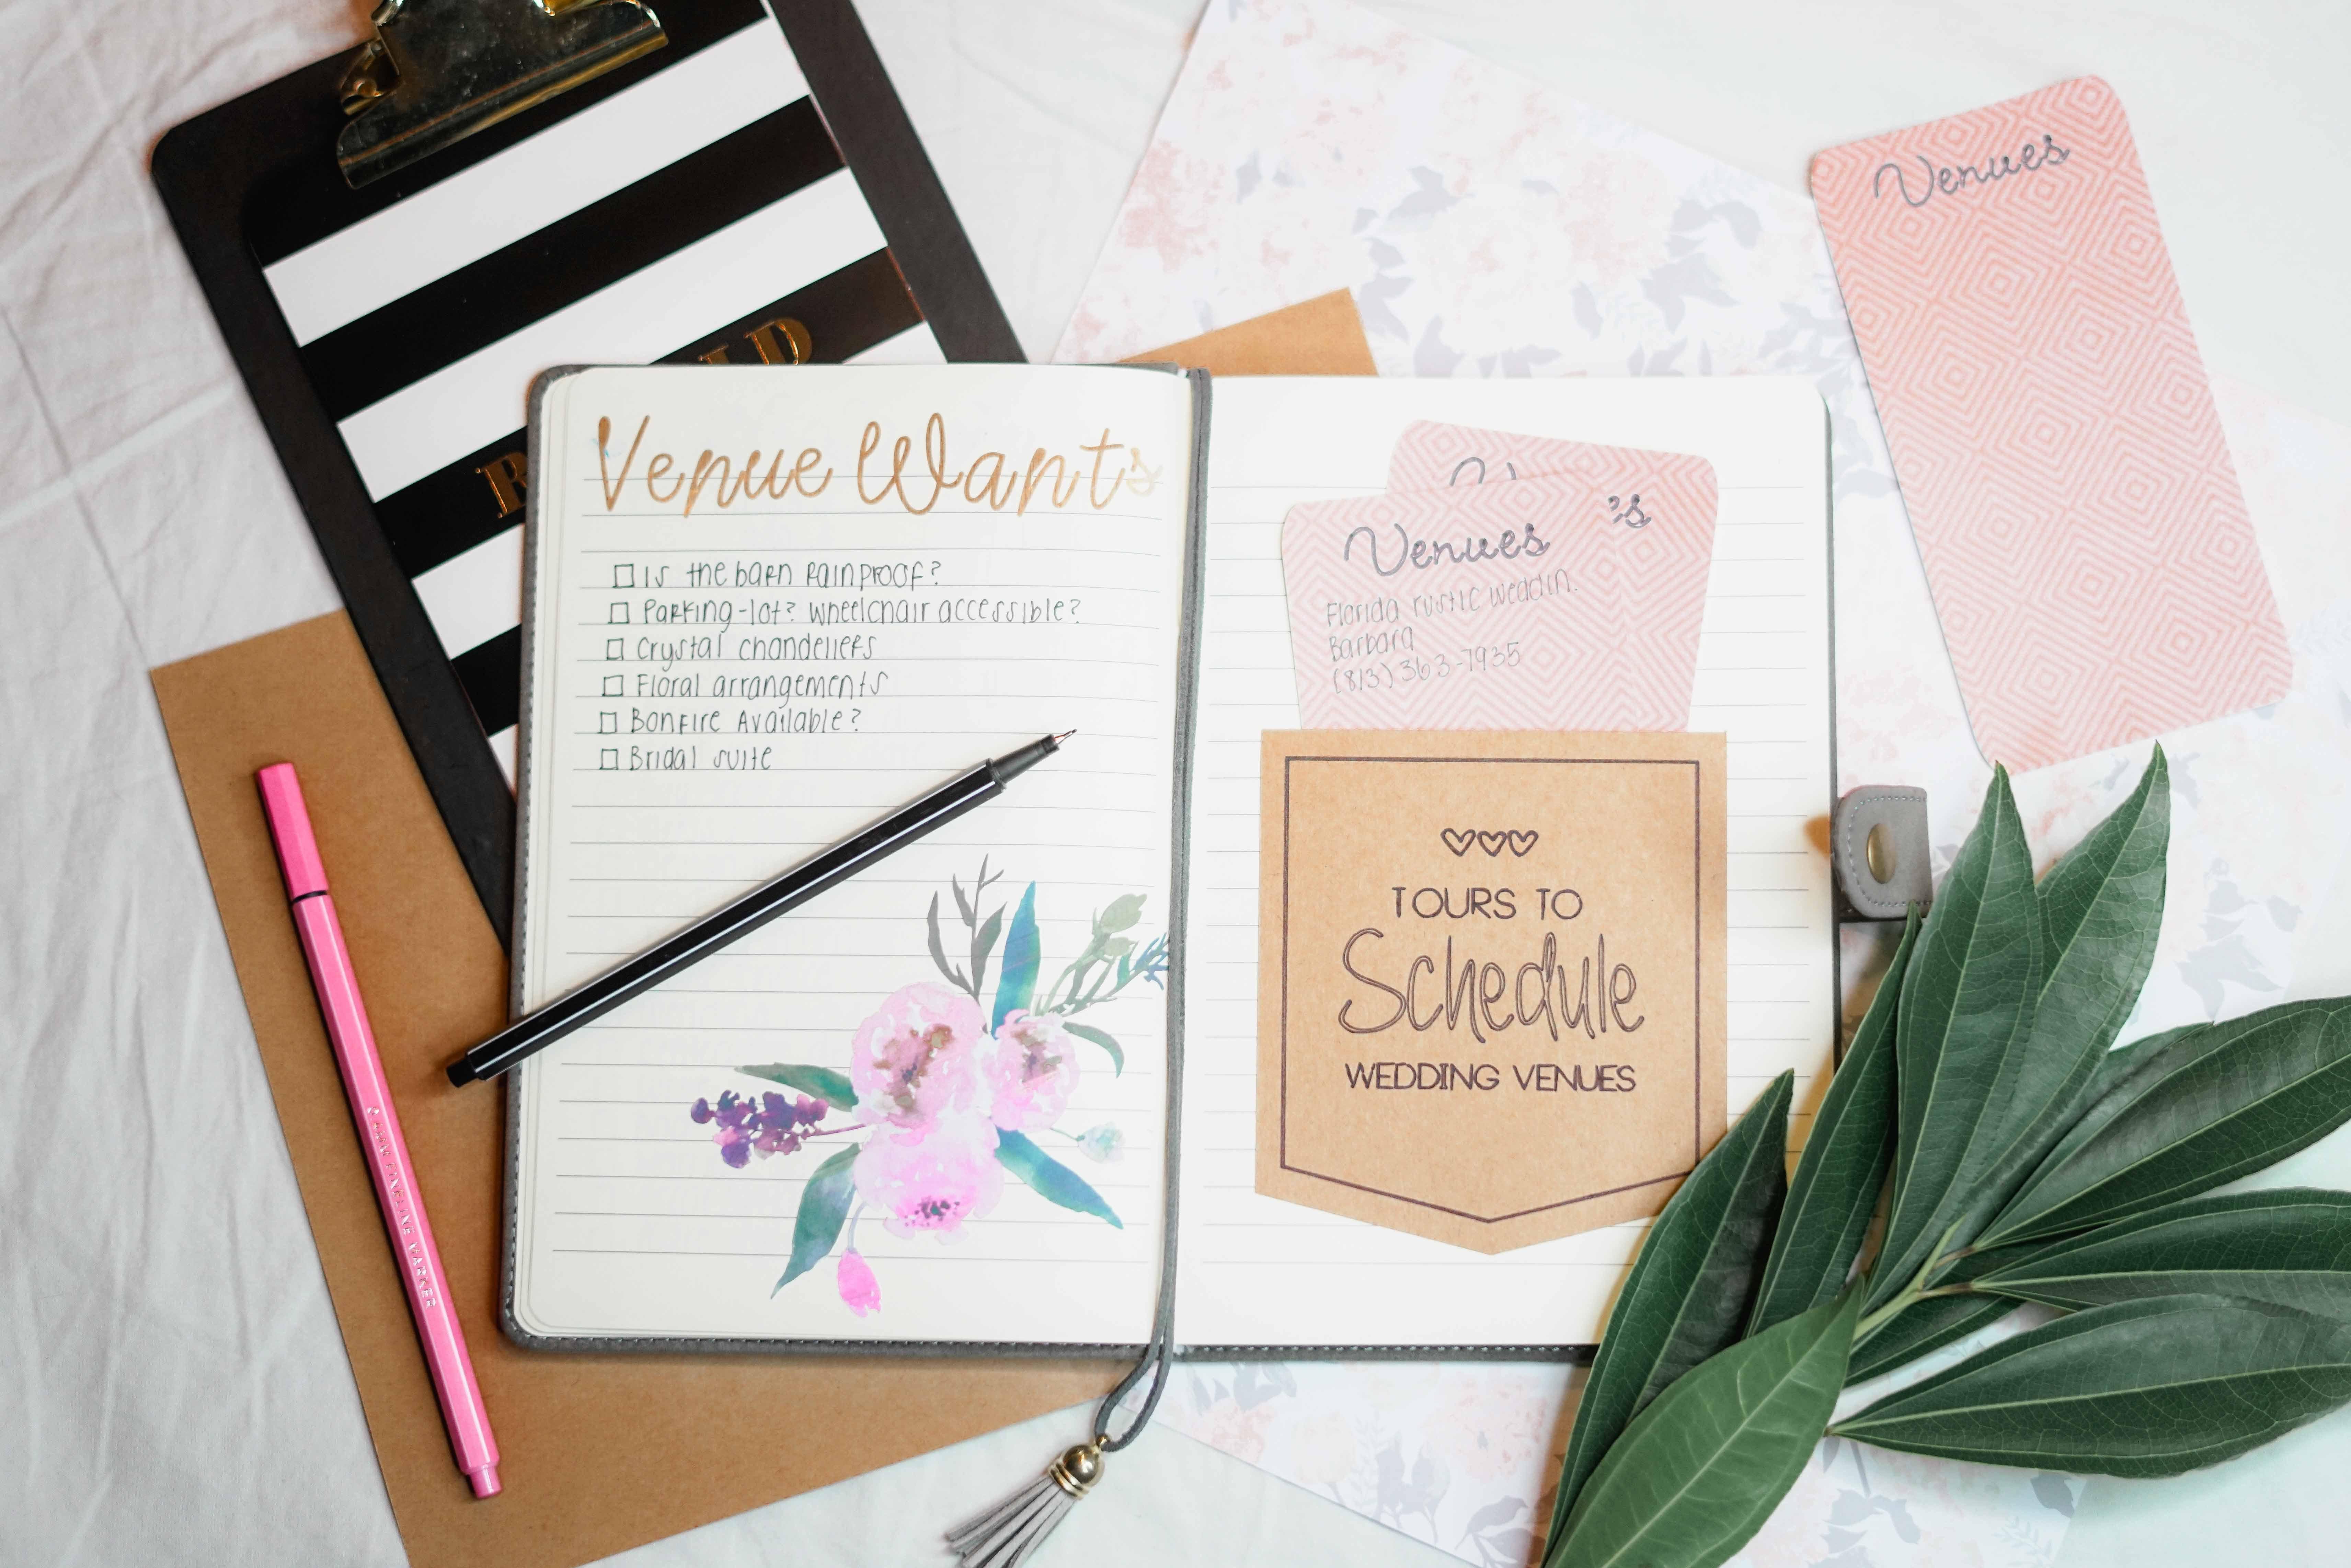 Wedding Season finally kicks off - get planning